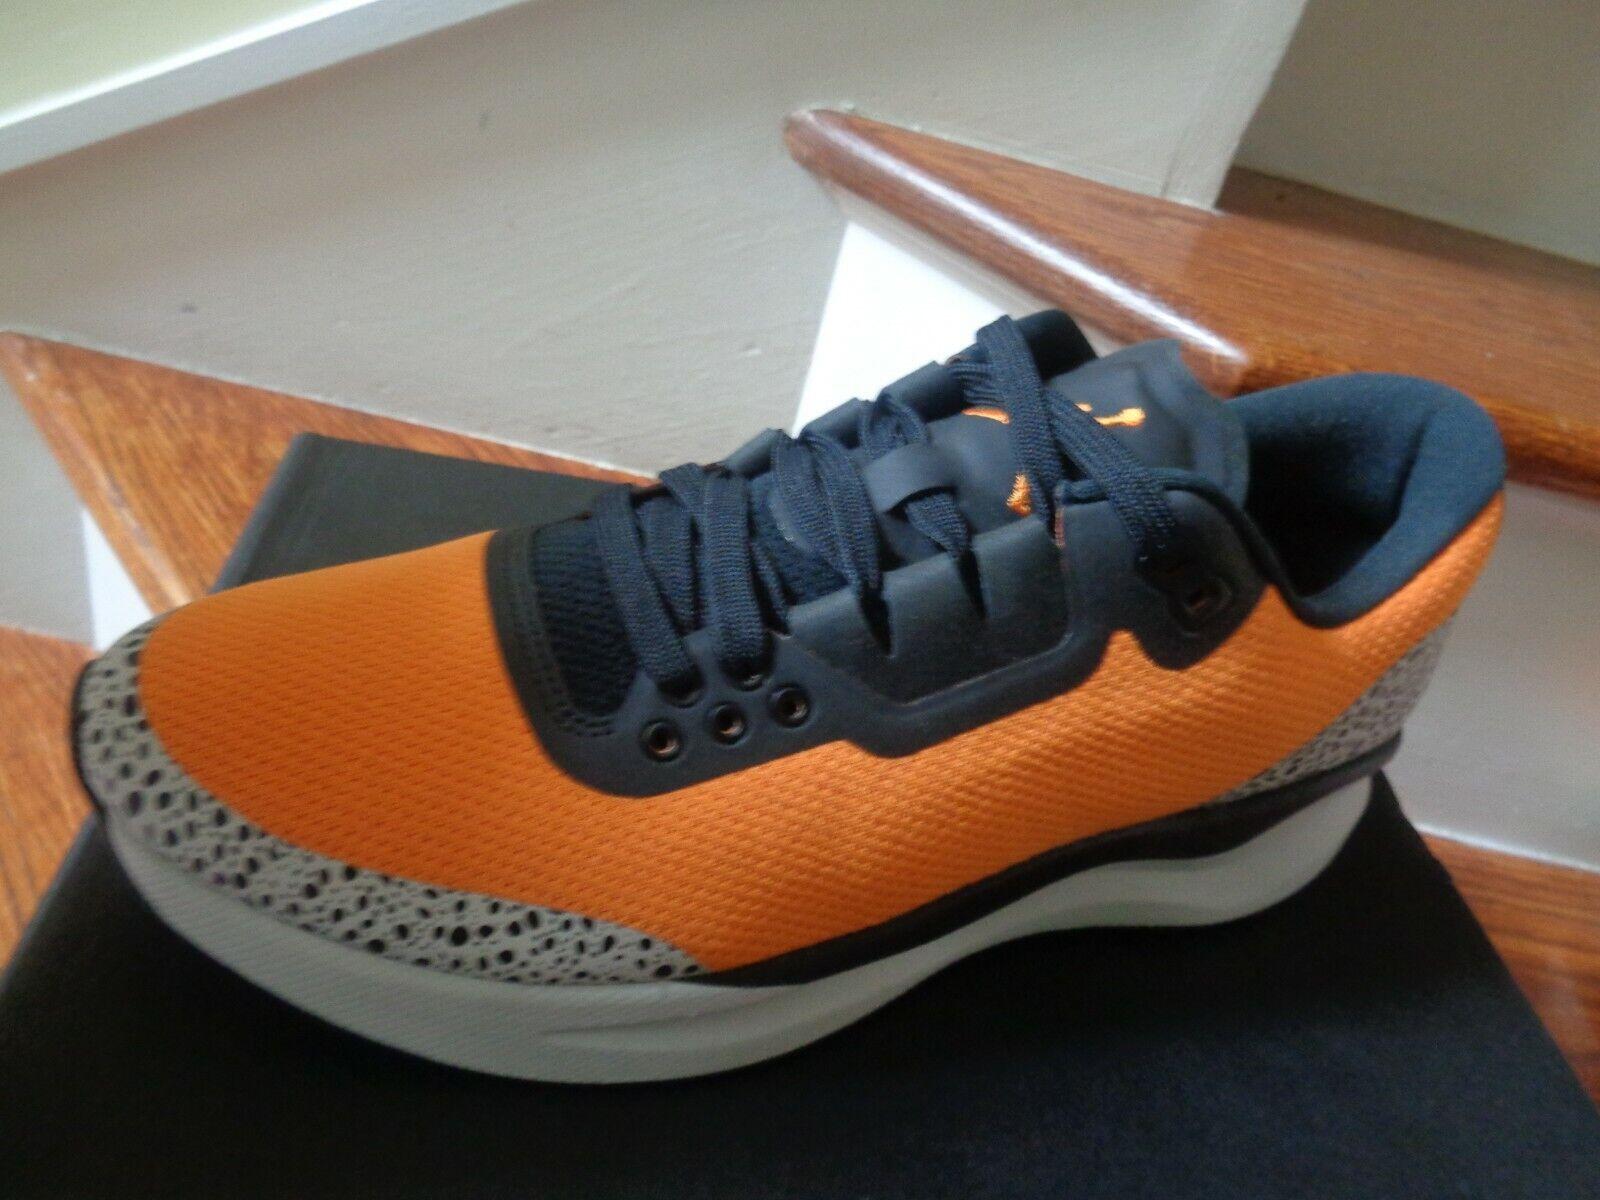 Nike Air Jordan Zoom Tenacity 88 Men's Running shoes, AV5878 800 Size 9.5 NWB